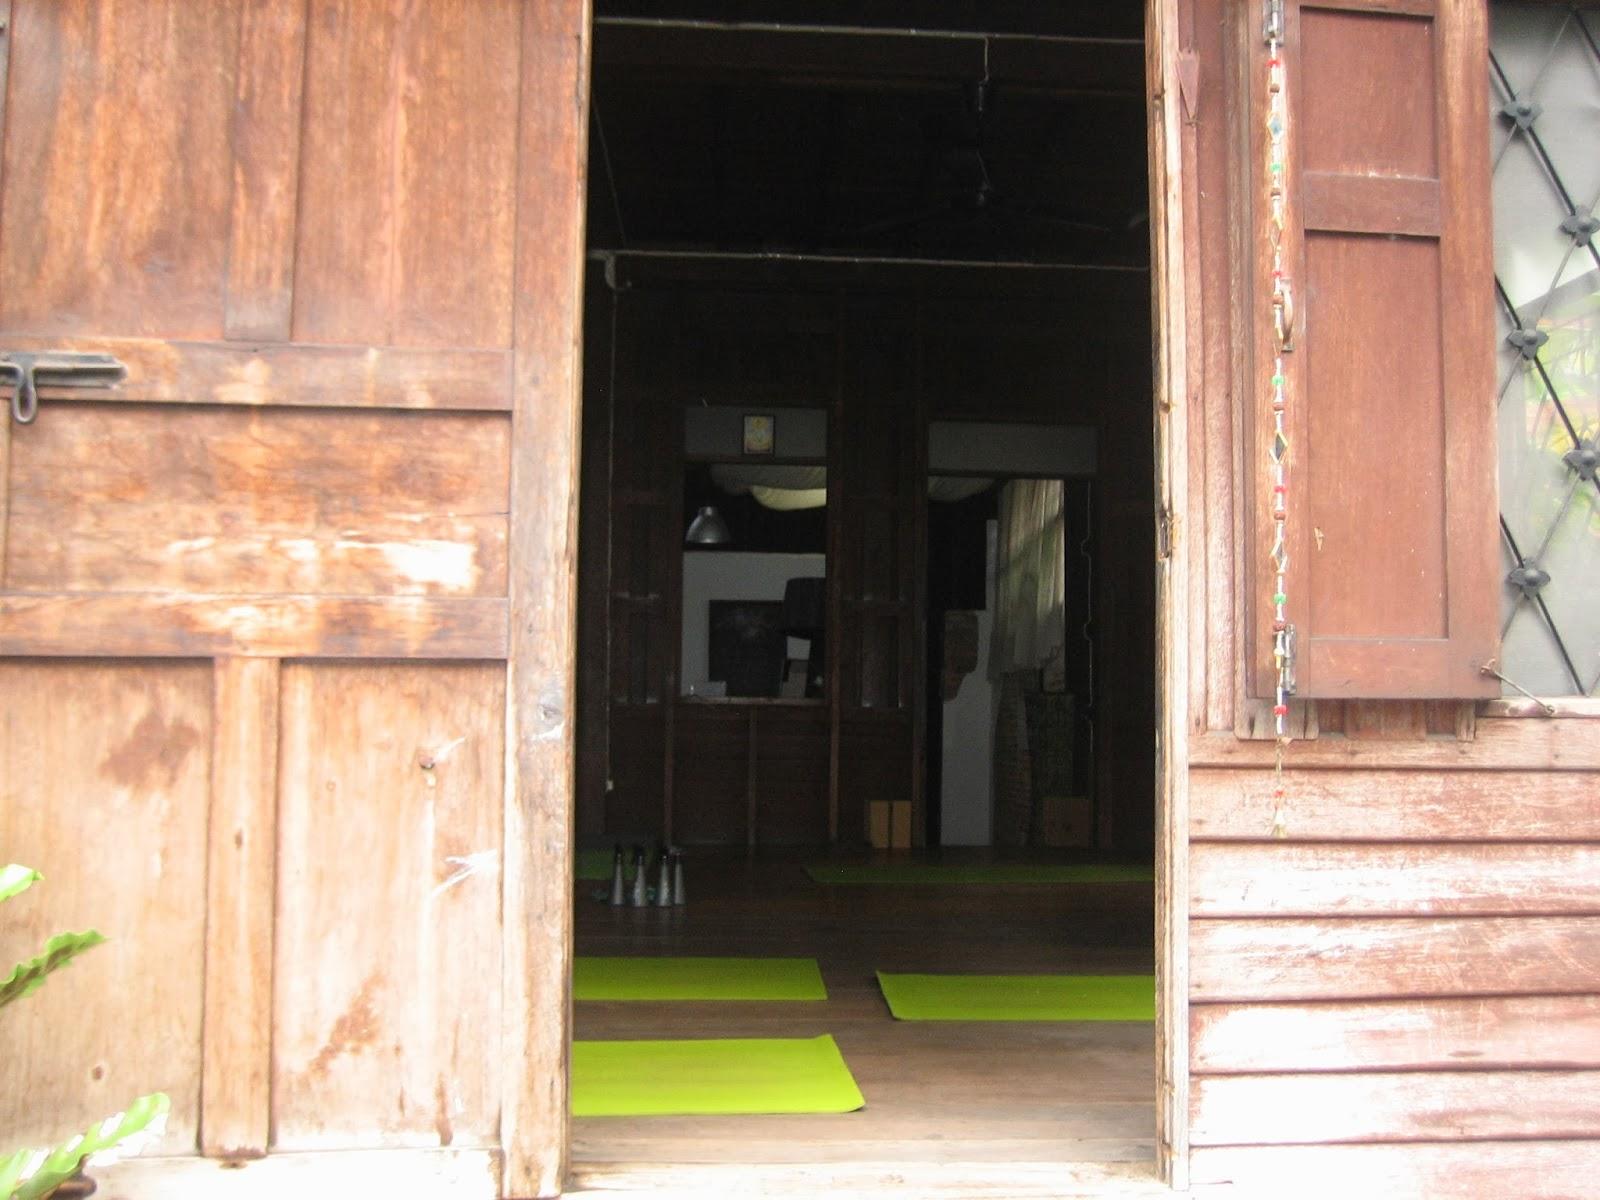 wild-rose-yoga-studio-chiang-mai